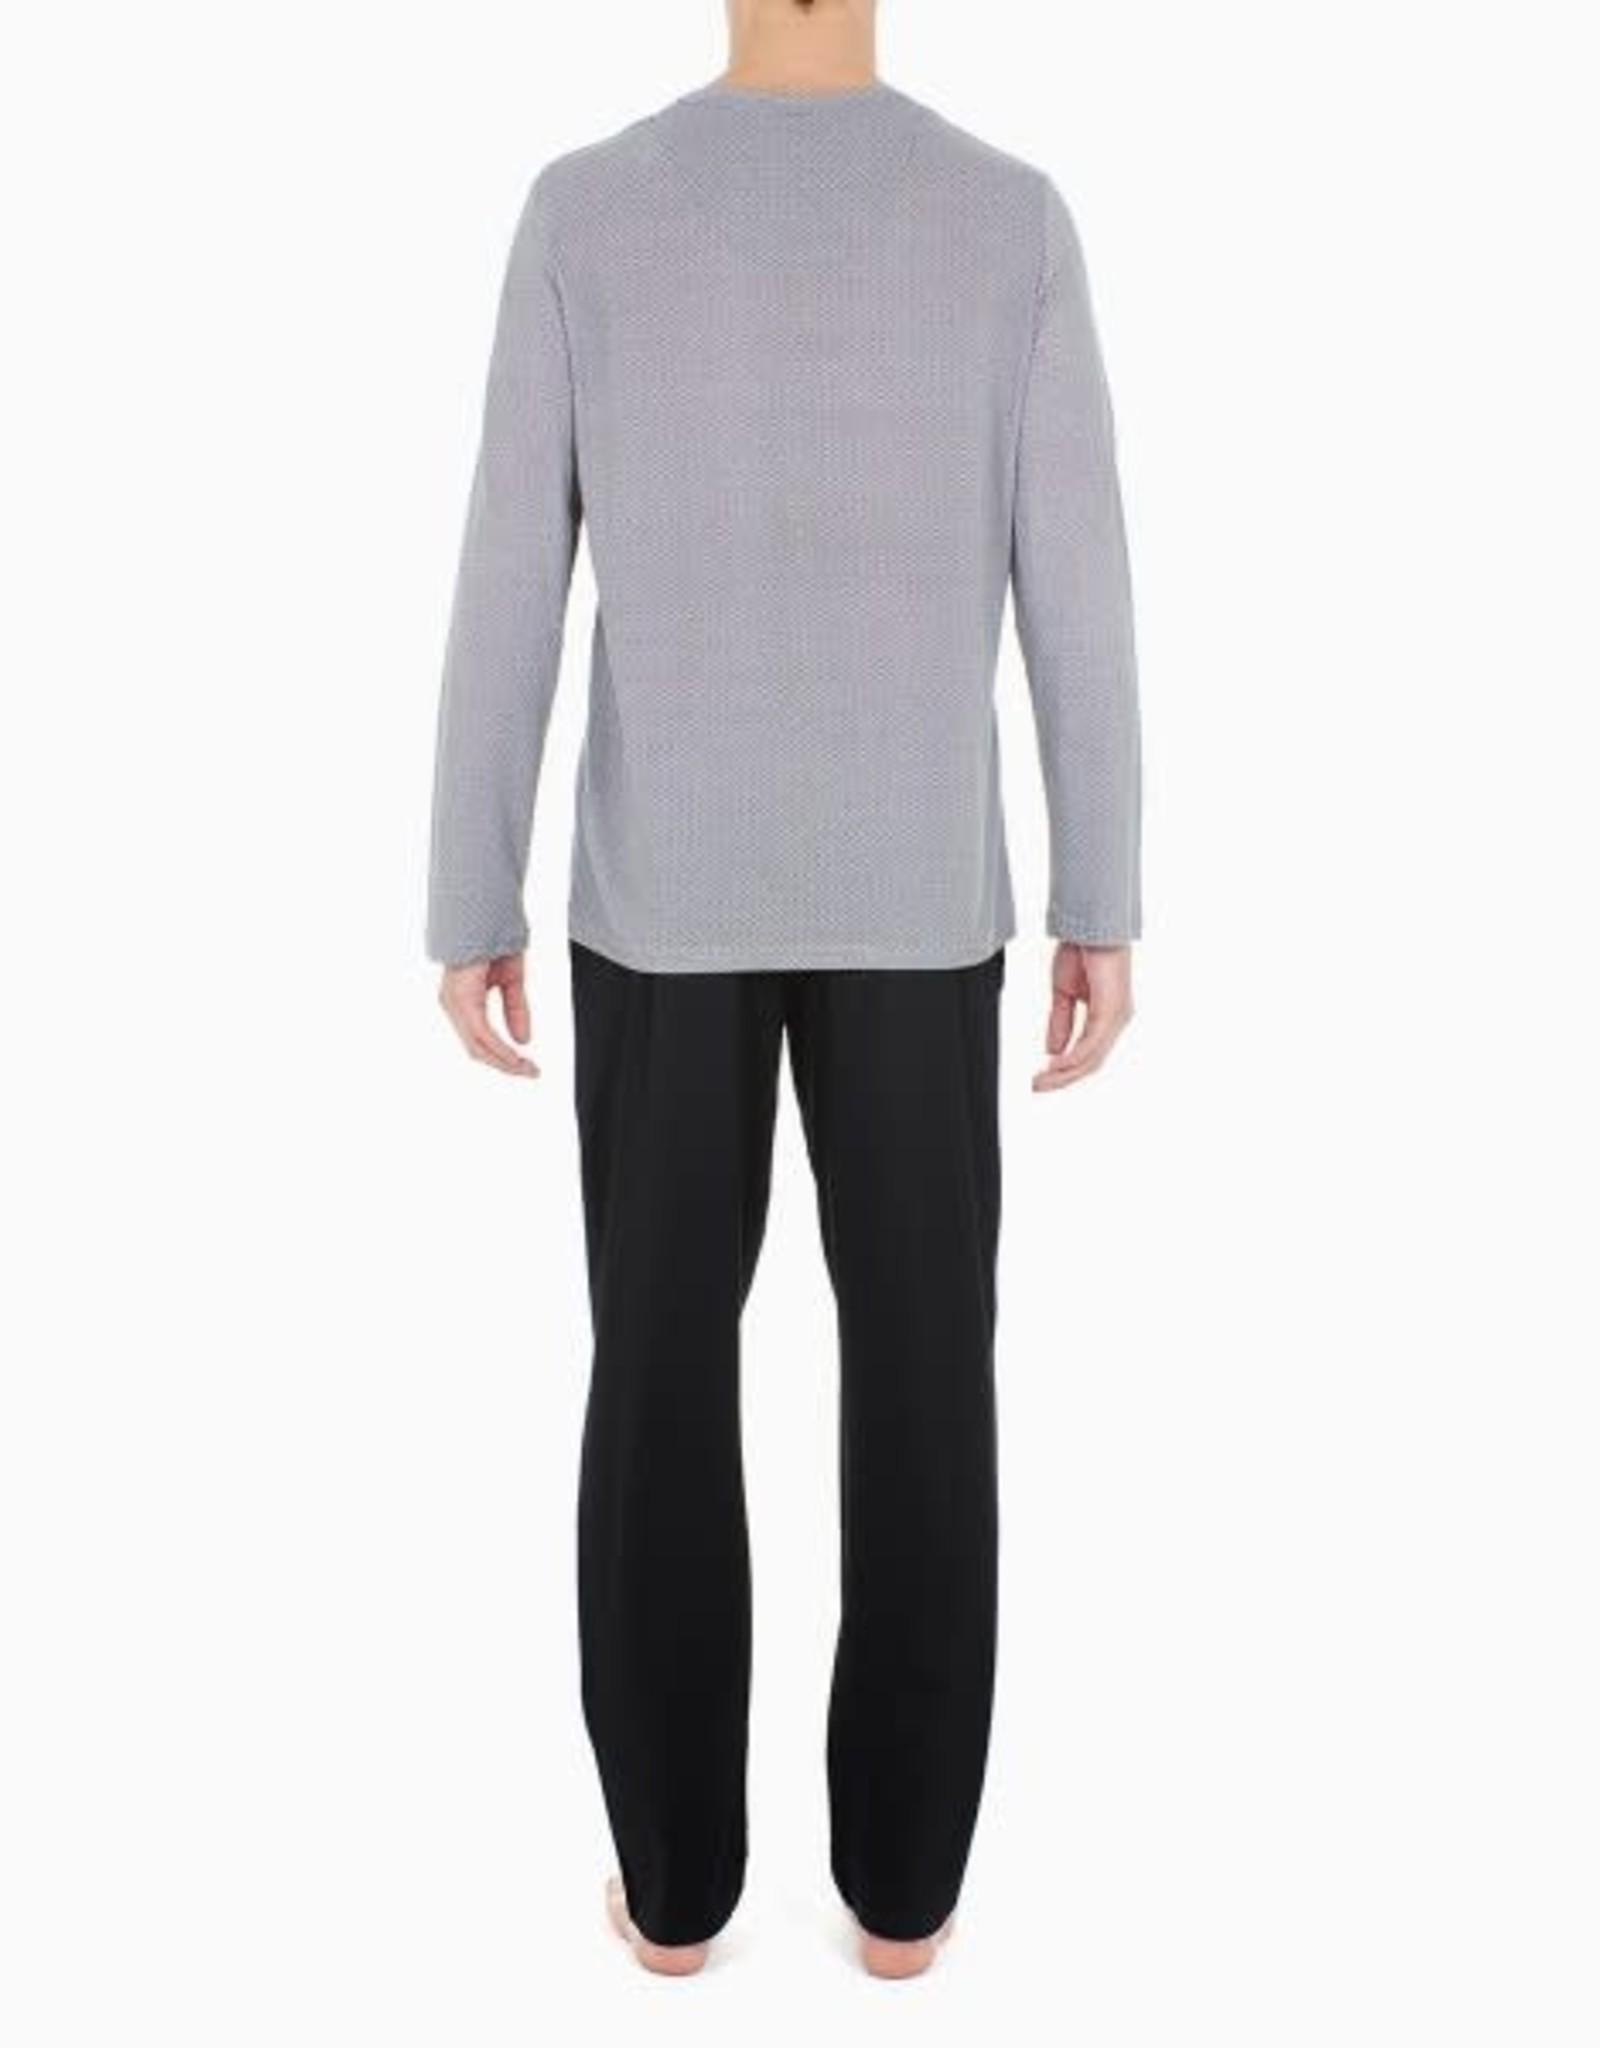 HOM Long sleepwear - Cravat